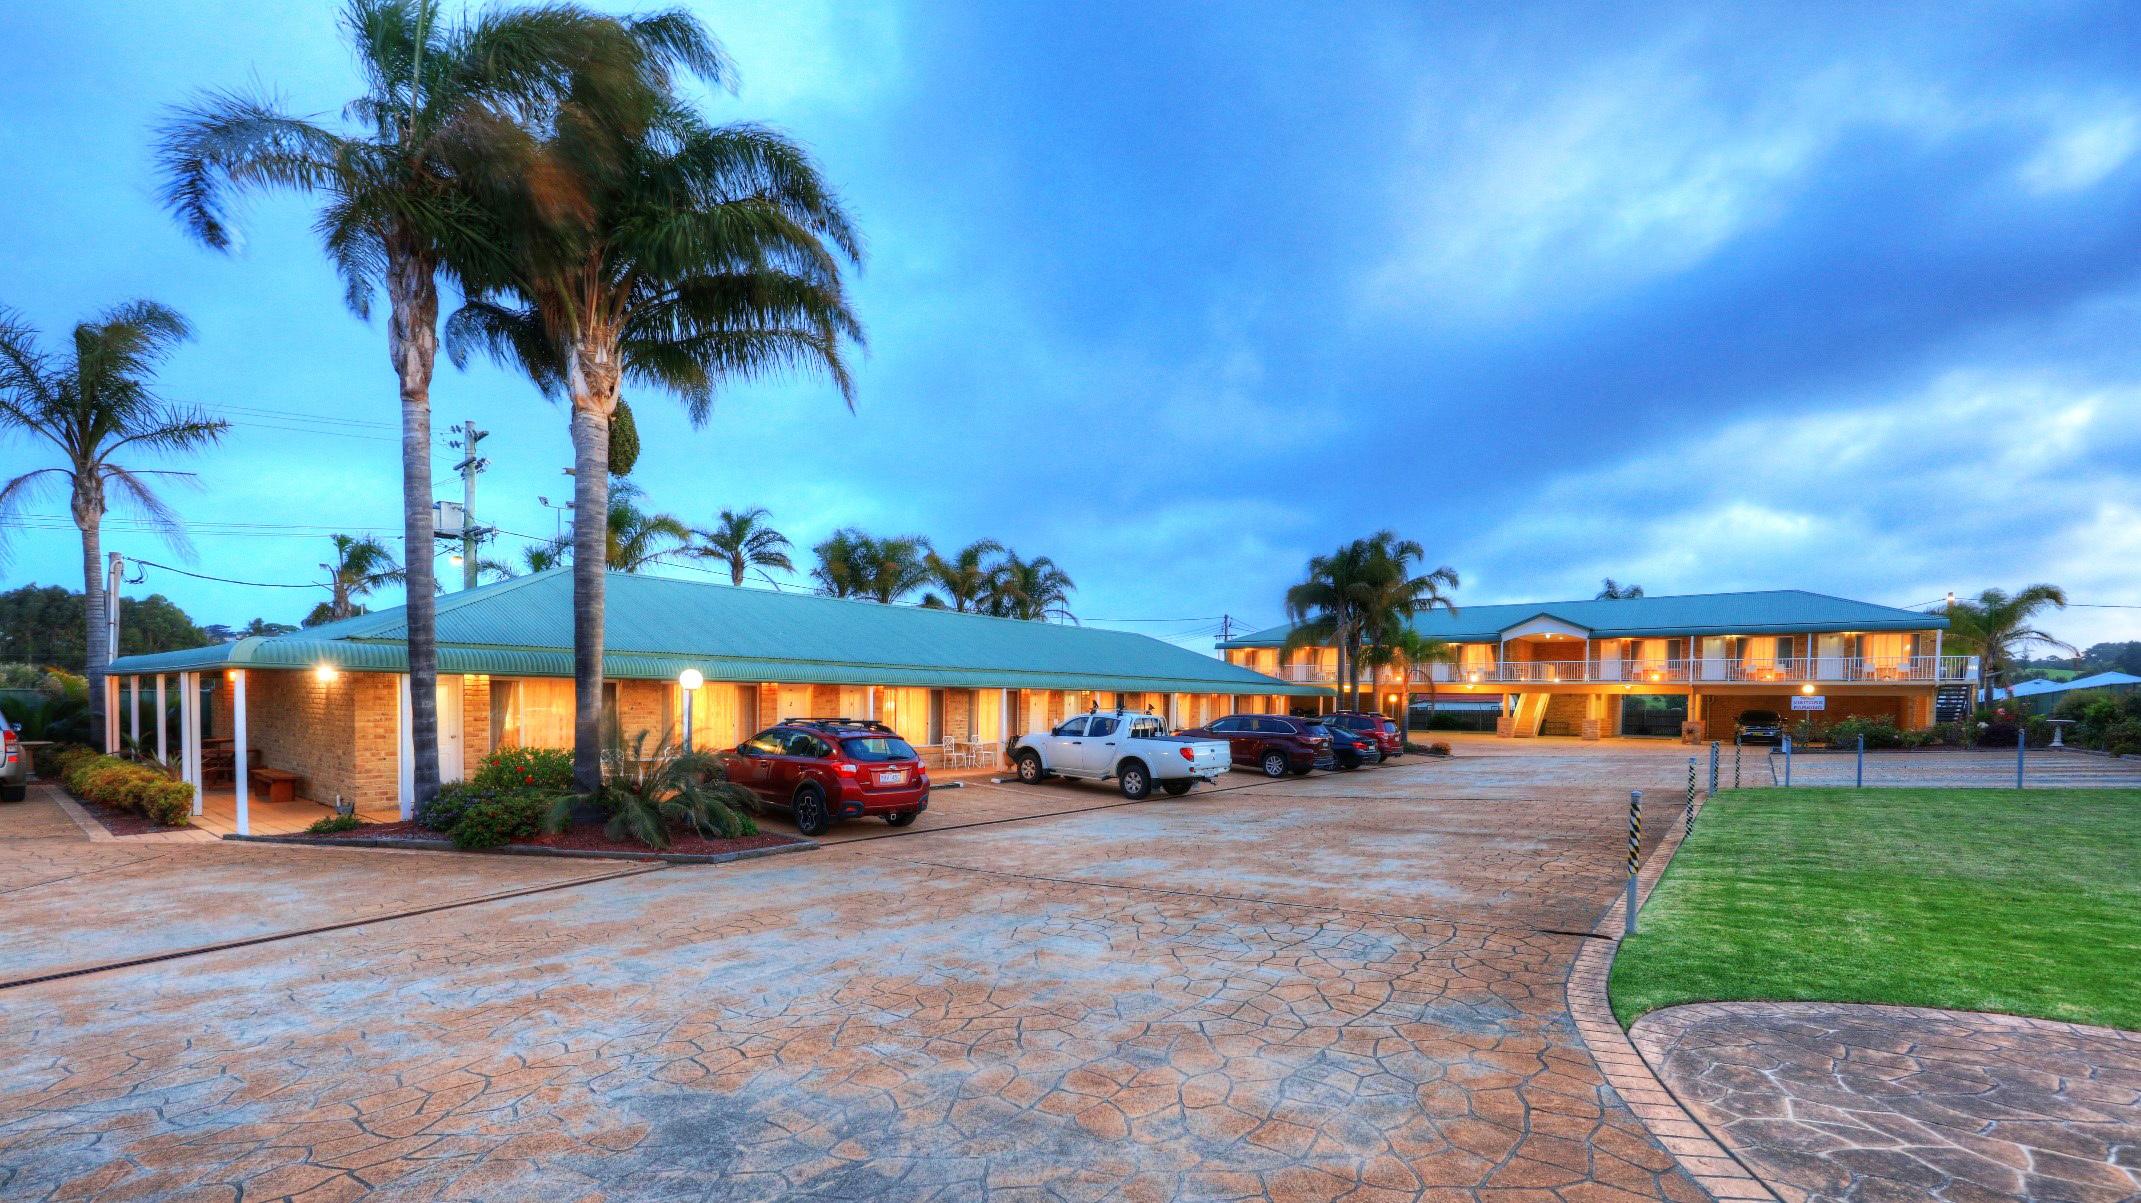 j - Harbourview Motel